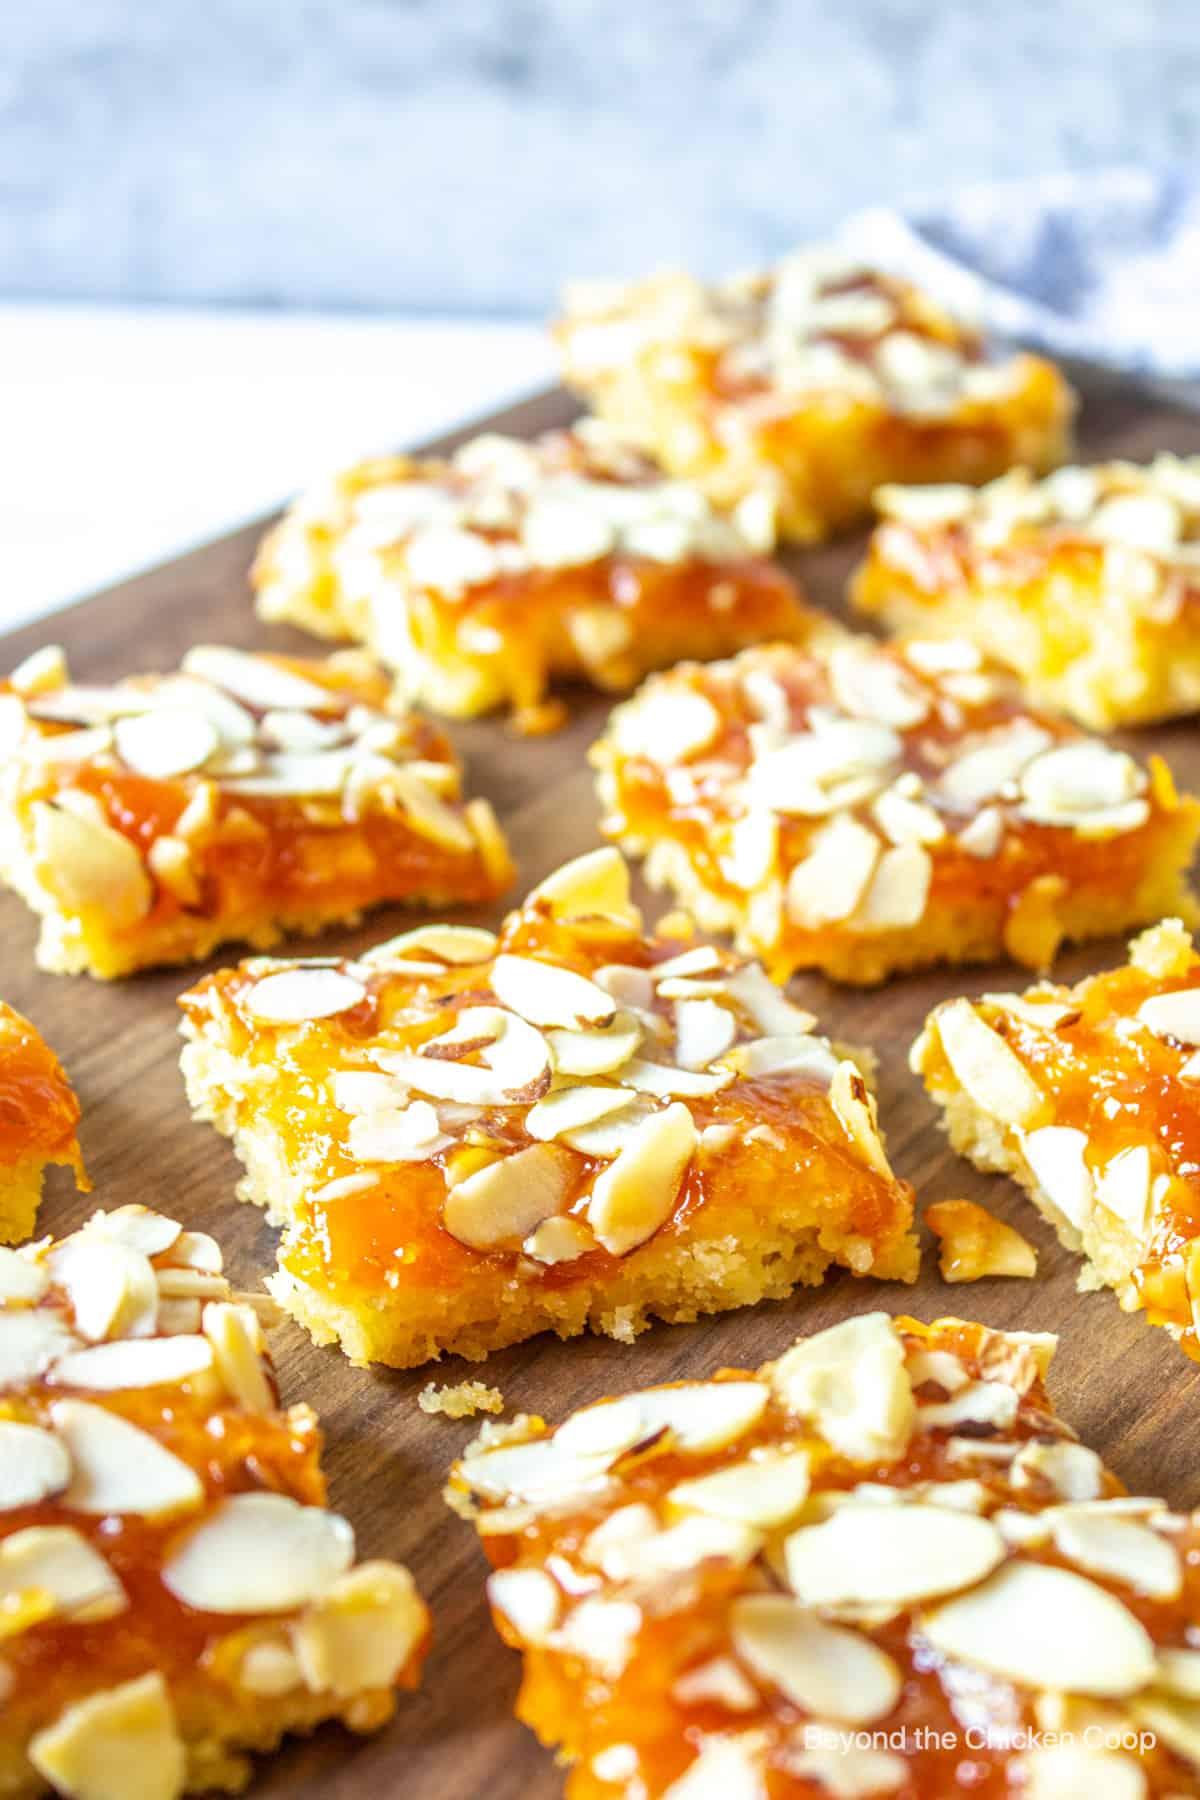 Apricot Almond Bars cut into squares.